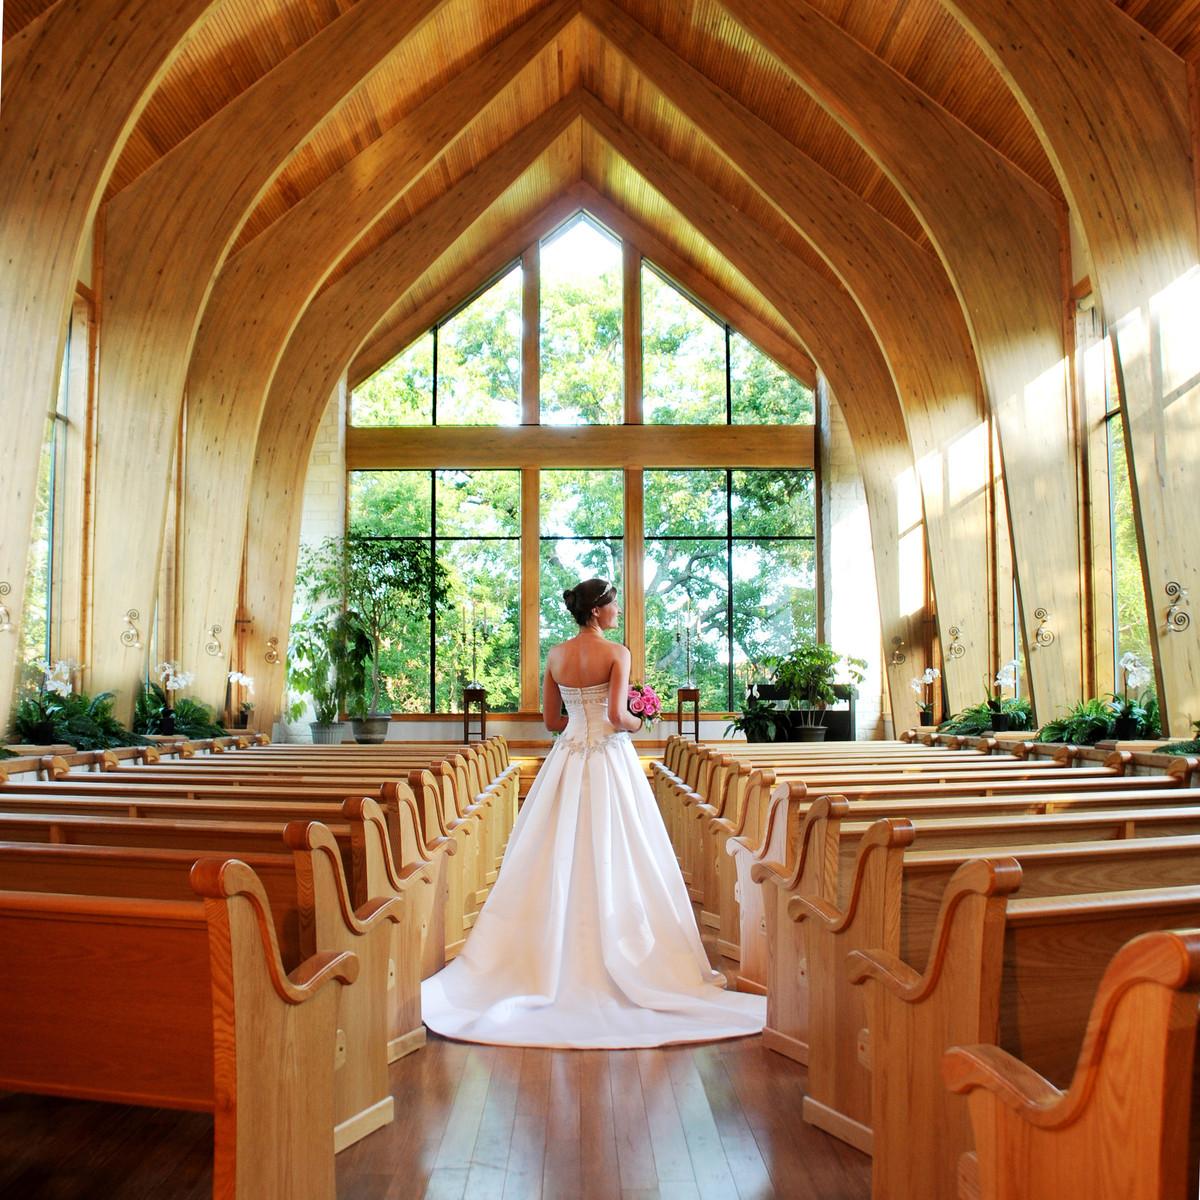 Ceremony And Reception Venues: Thunderbird Chapel, Wedding Ceremony & Reception Venue